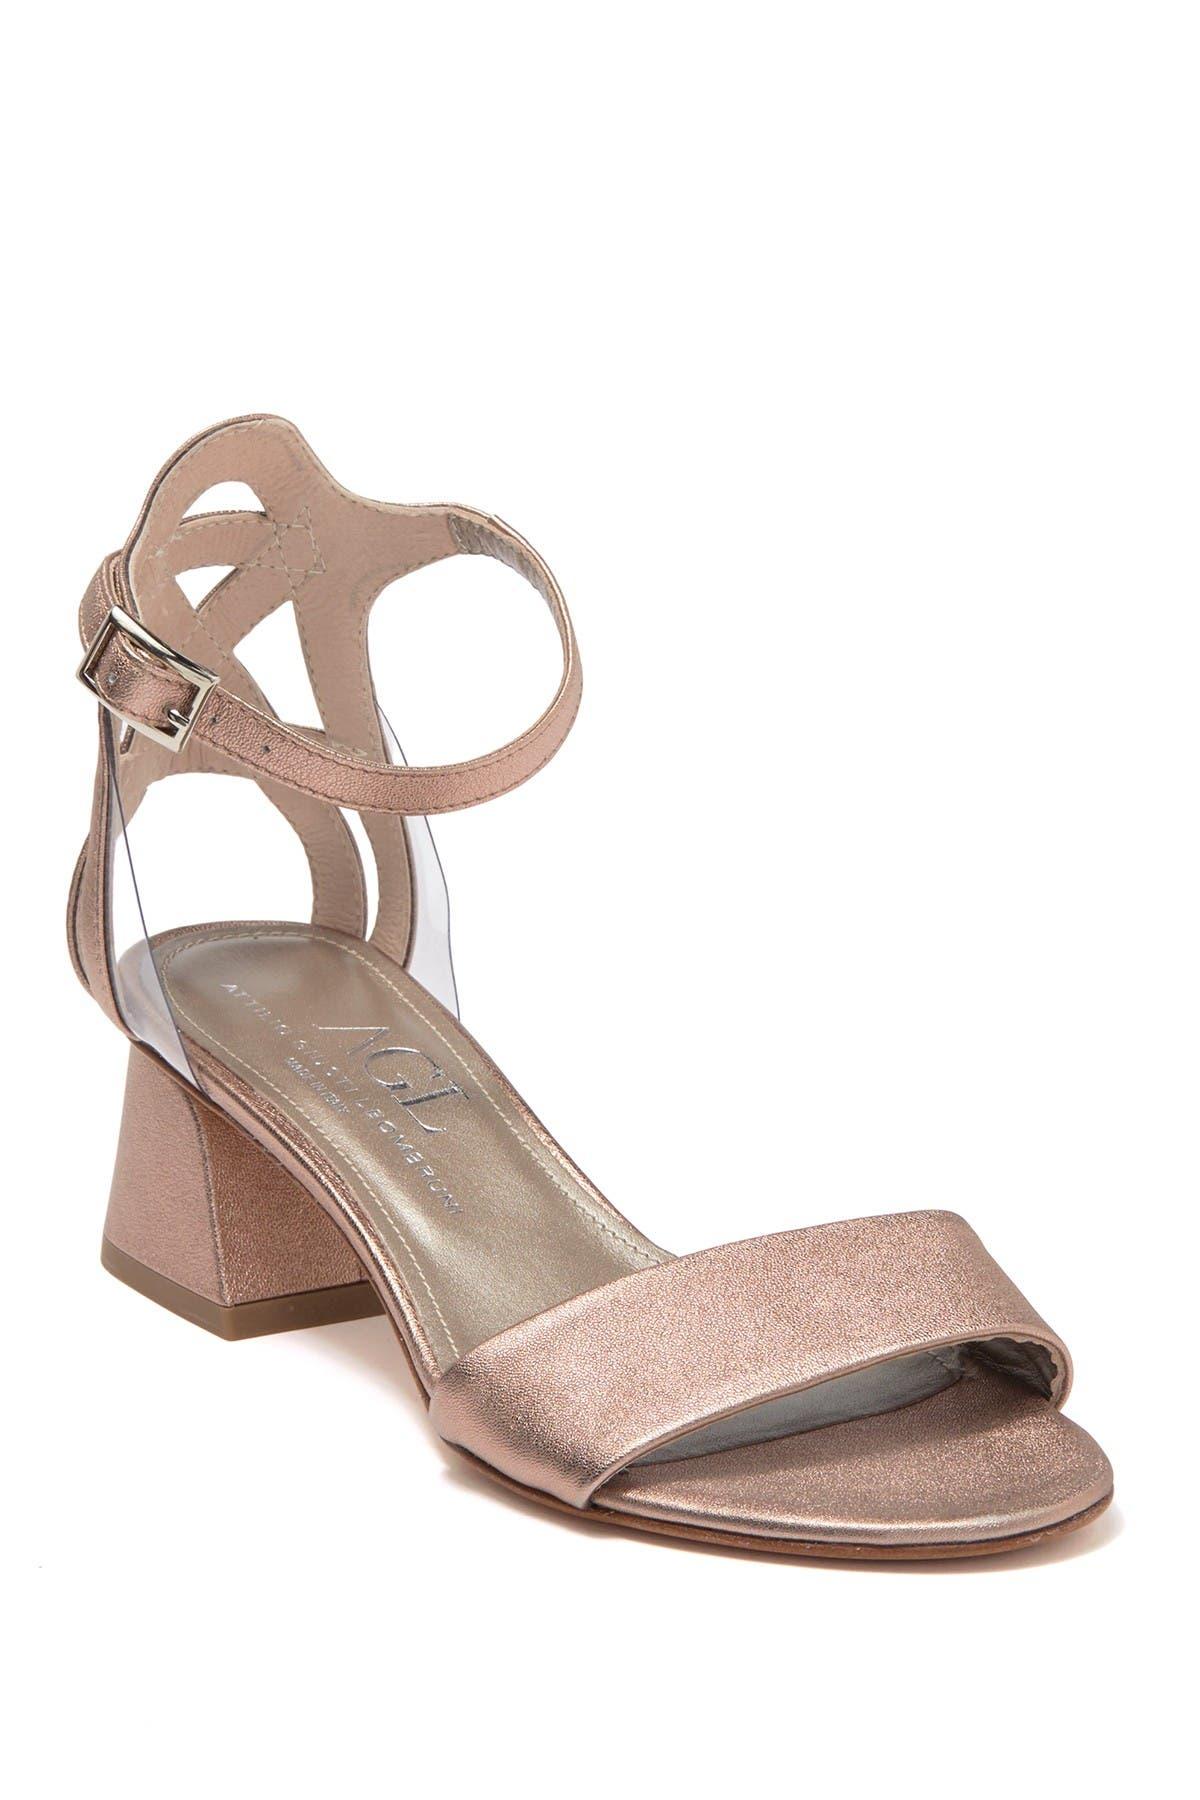 Image of AGL Metallic Leather Block Heel Sandal